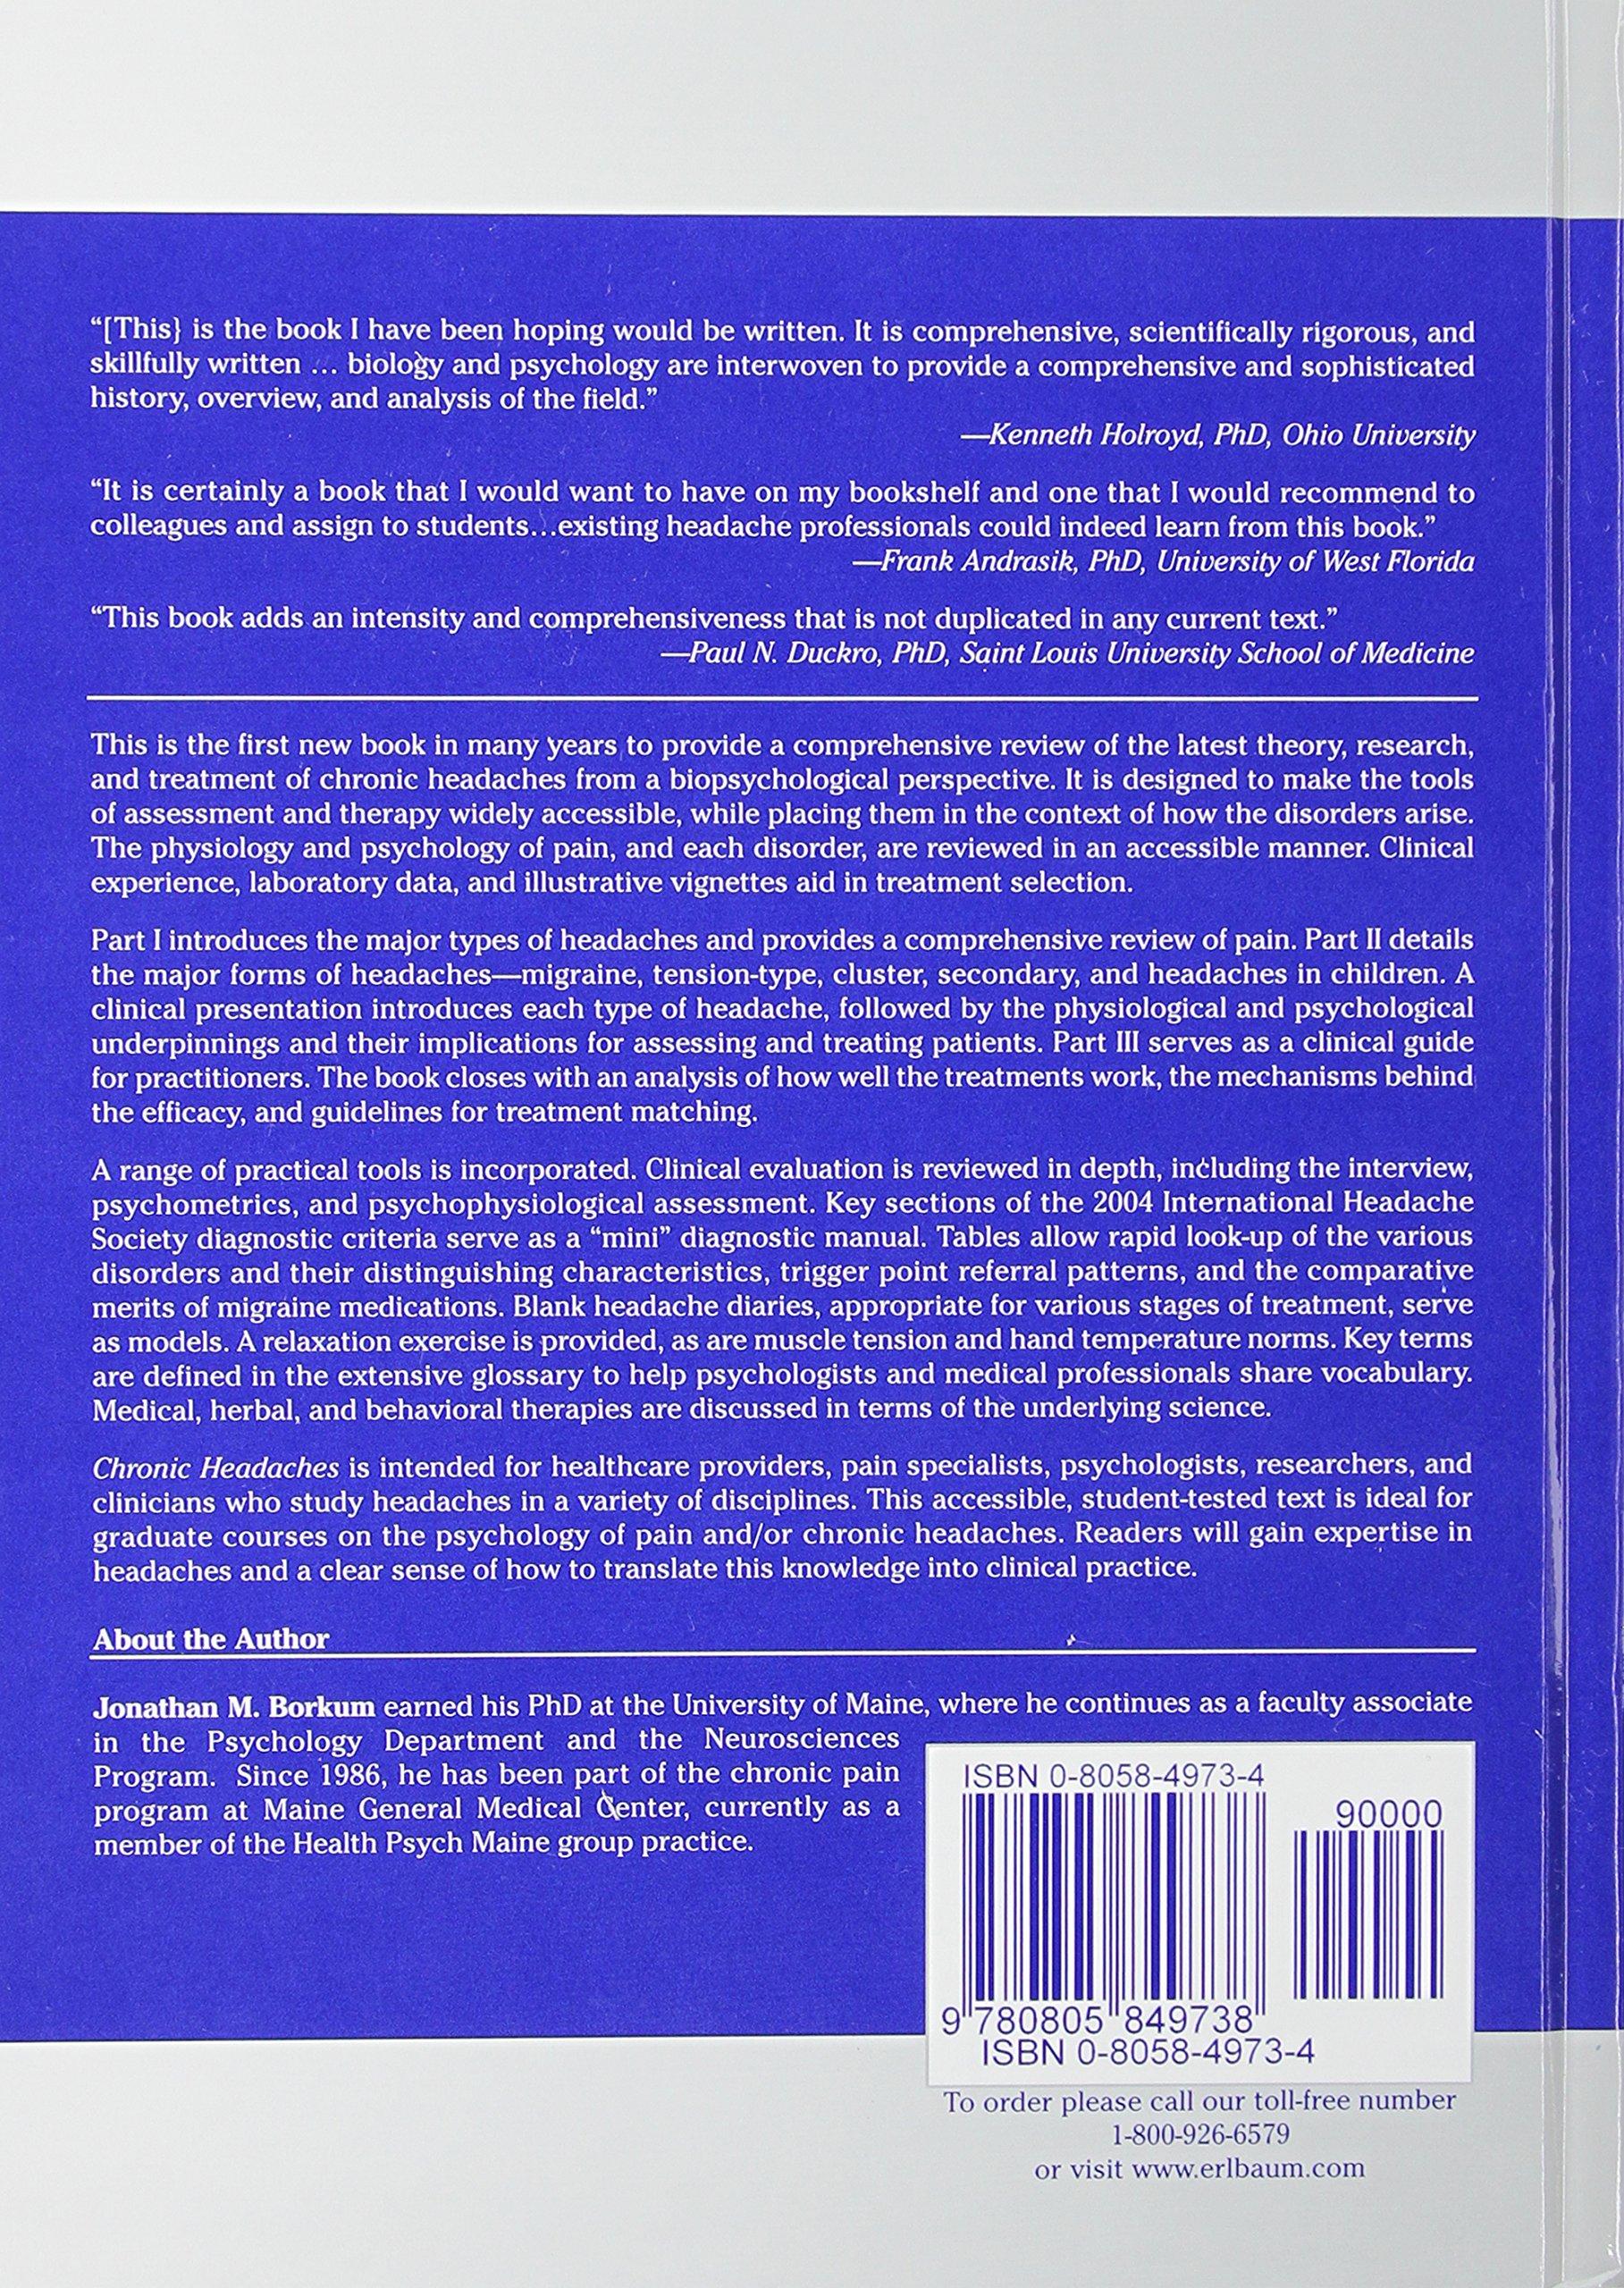 Chronic Headaches: Biology, Psychology, and Behavioral Treatment